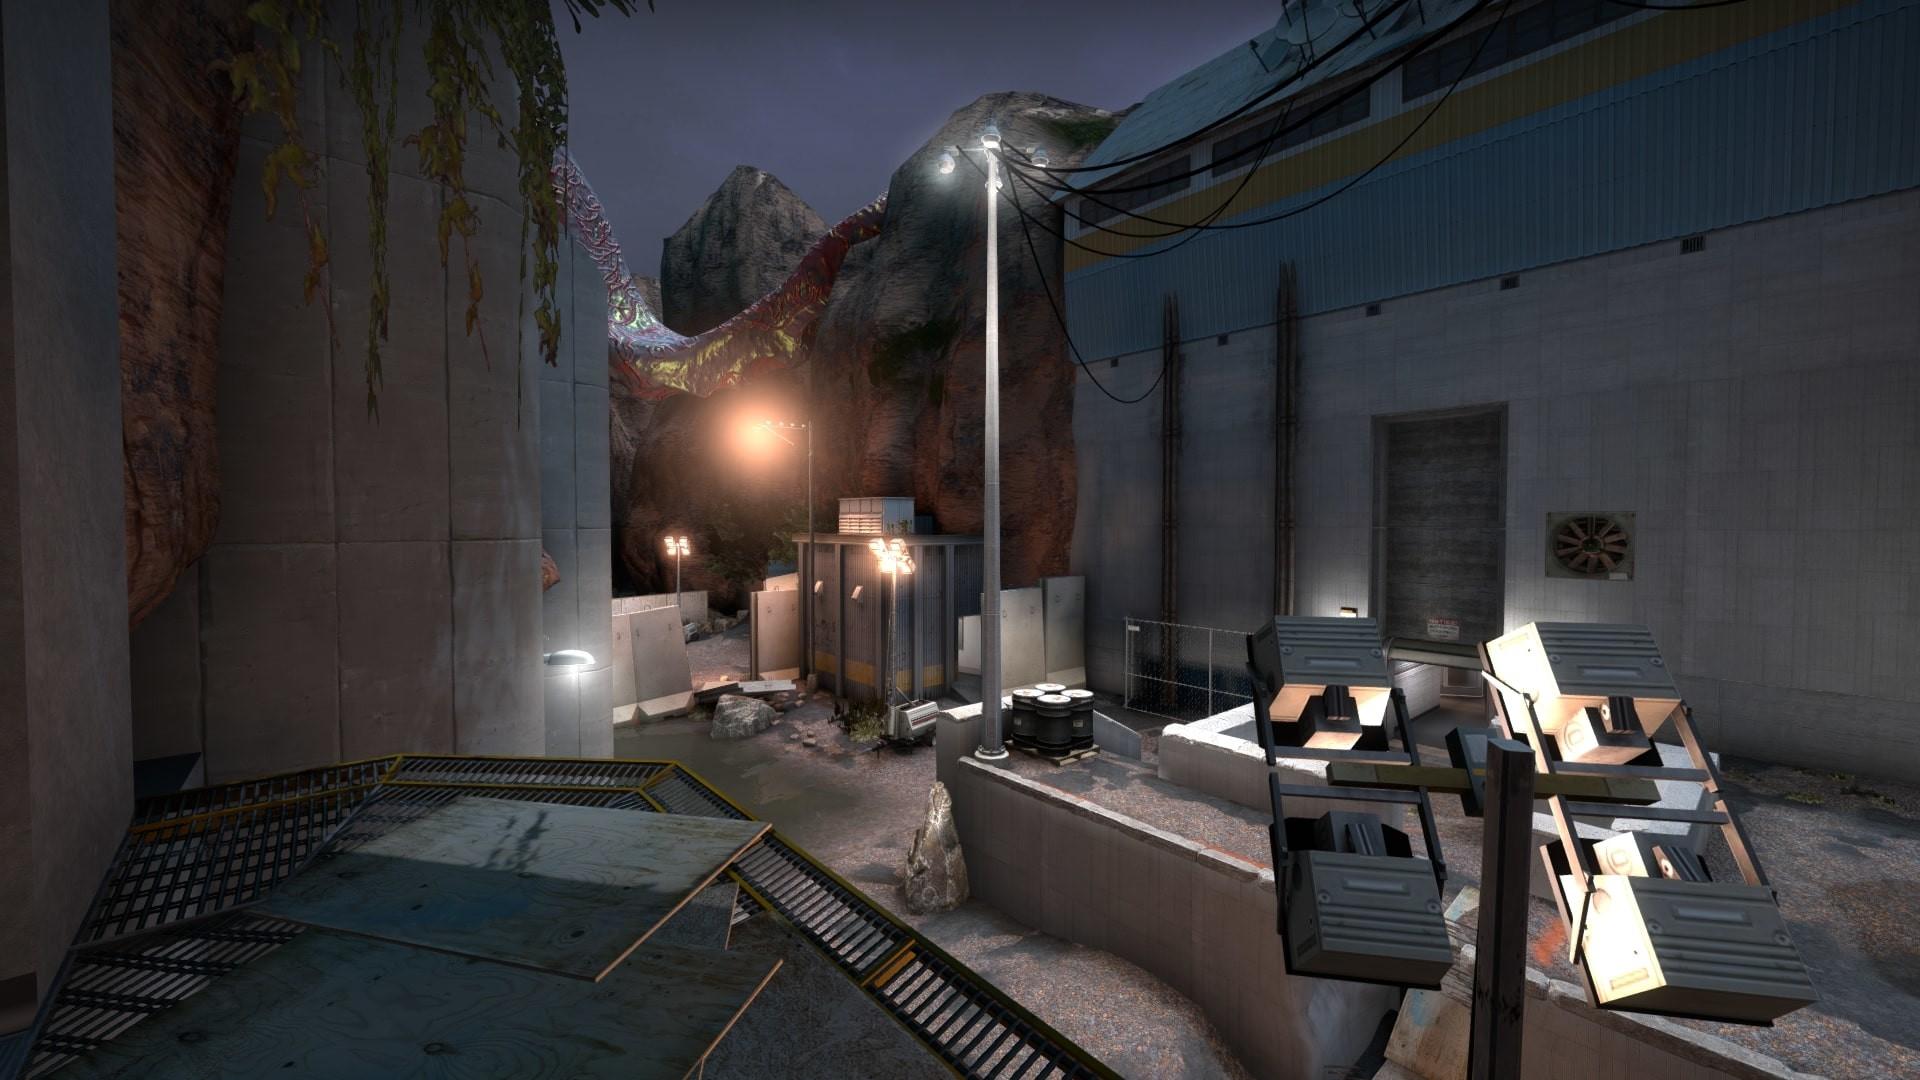 Counter-strike  Global Offensive Screenshot 2020.06.24 - 18.34.20.40.jpg